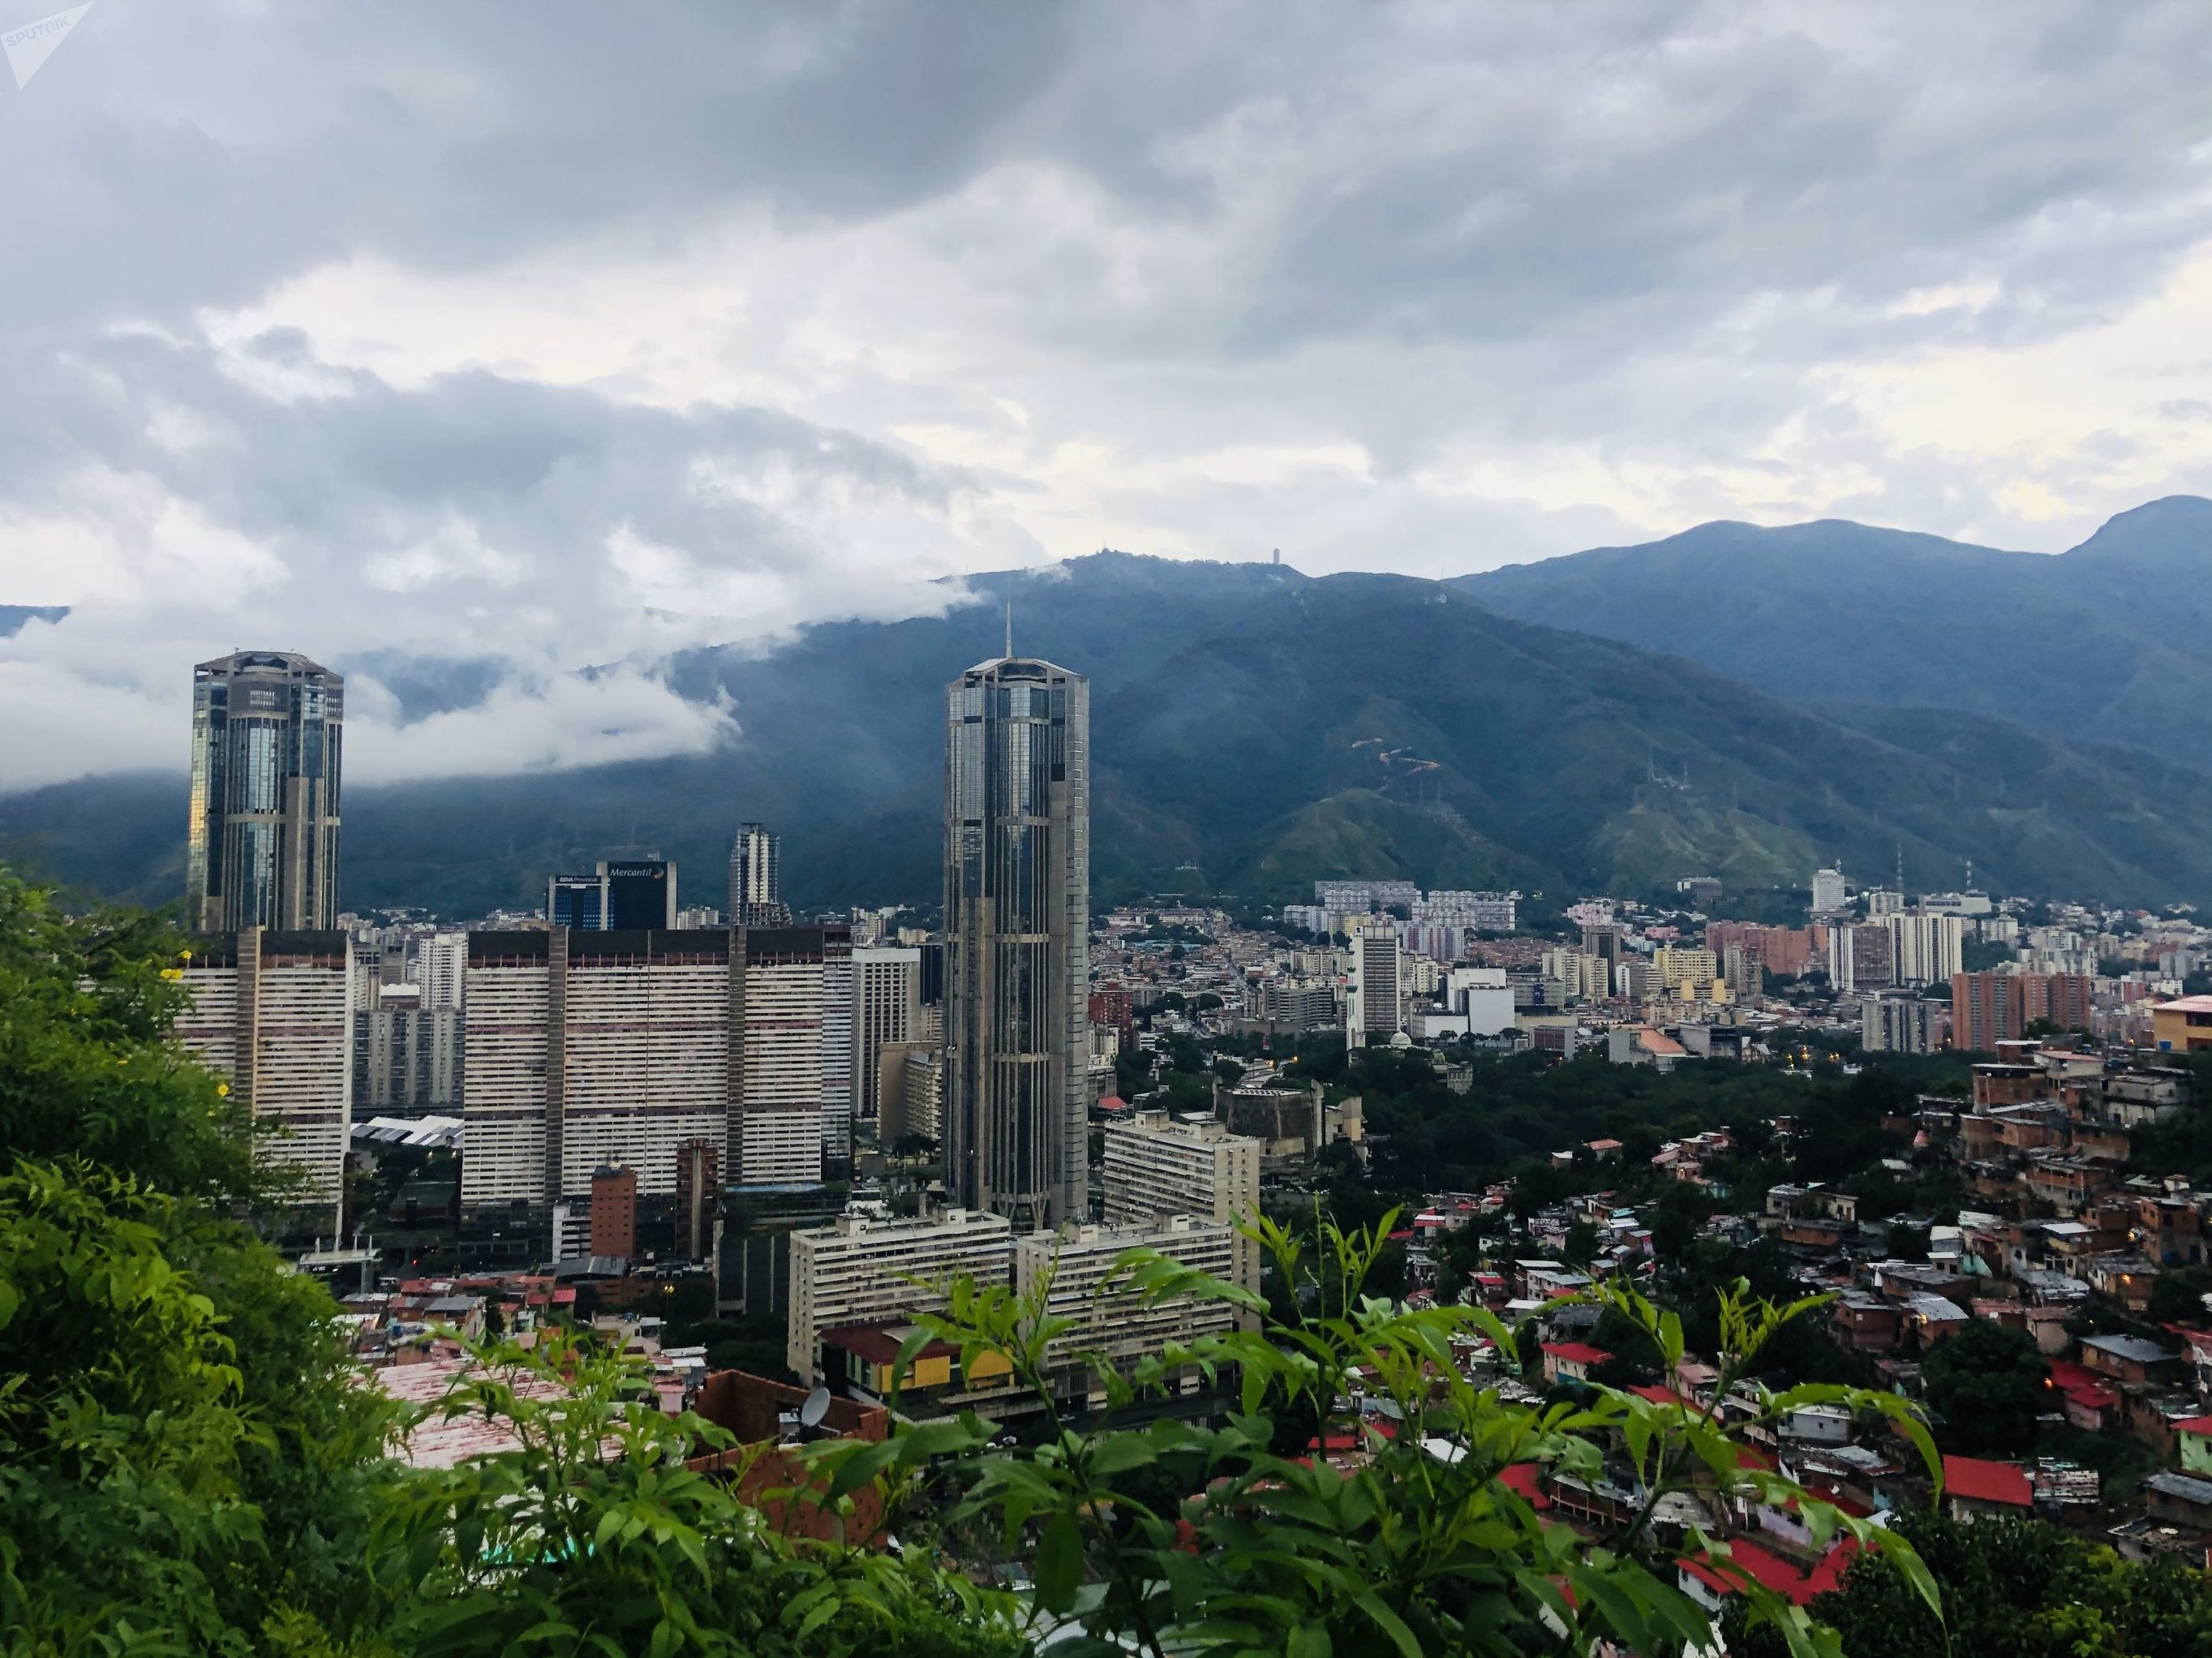 Vista panorámica de Caracas, Venezuela